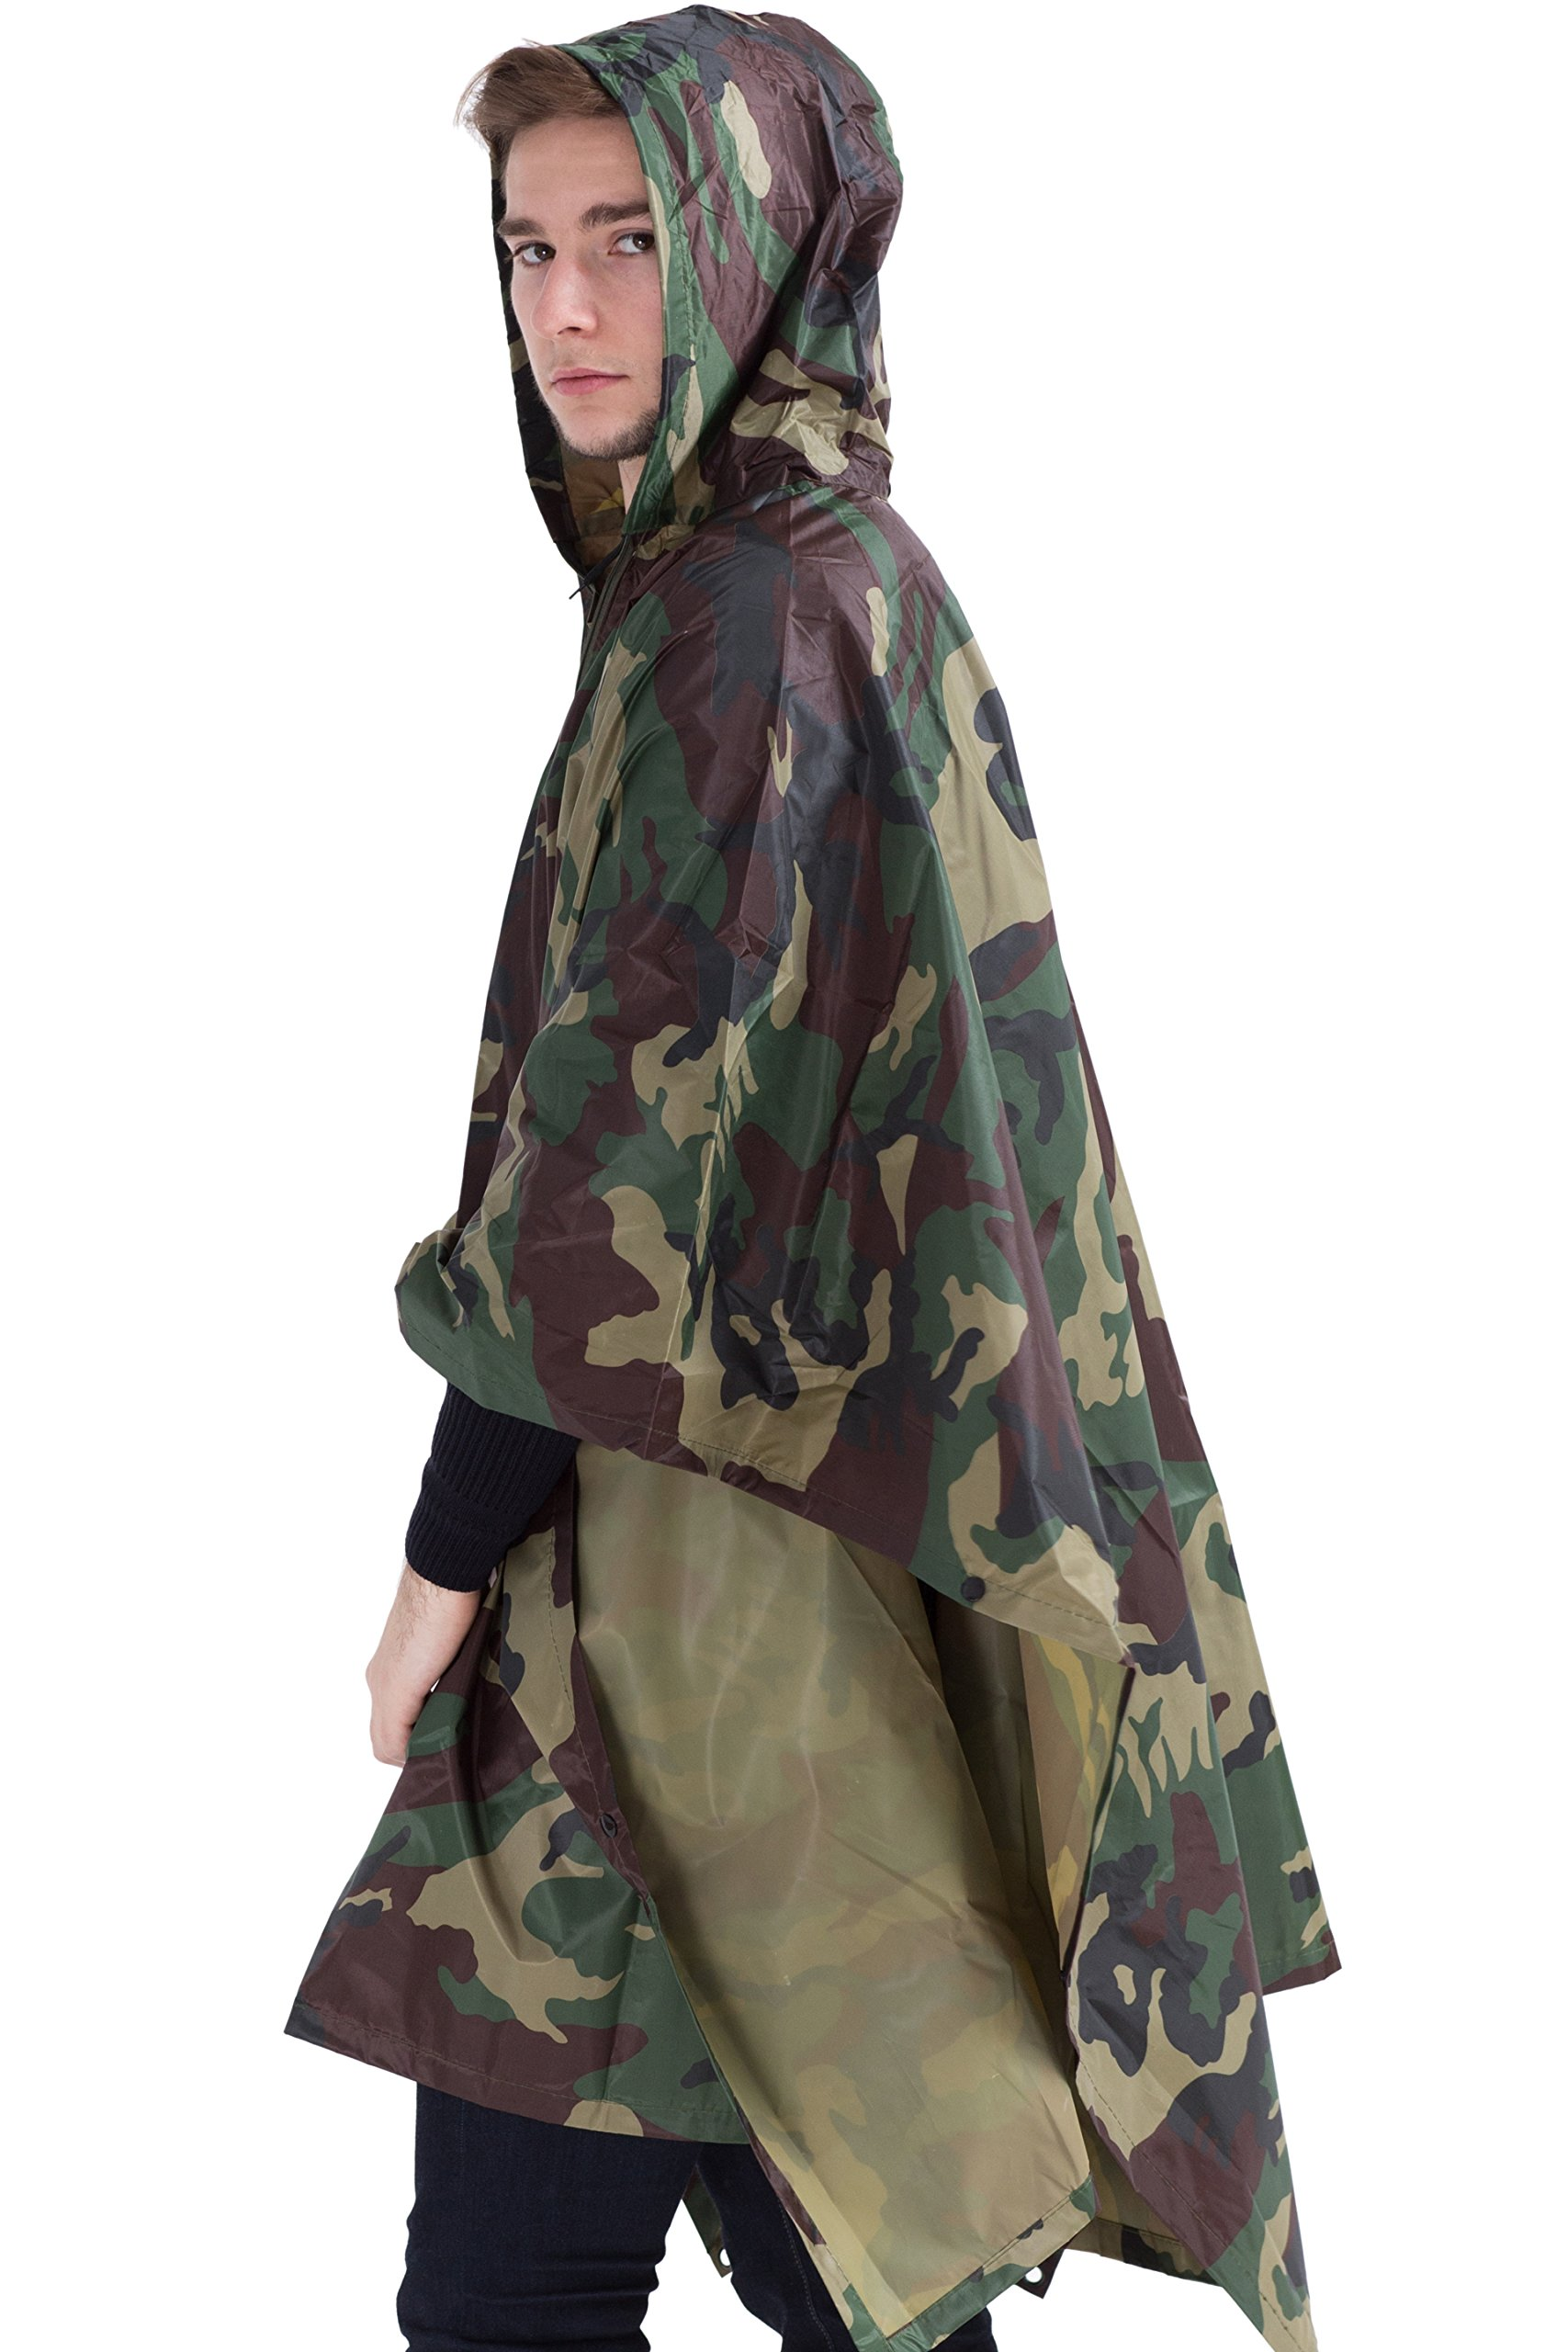 Msmsse Men's Rain Poncho Outdoor Multifunction Military Raincoat Jungle Camouflage